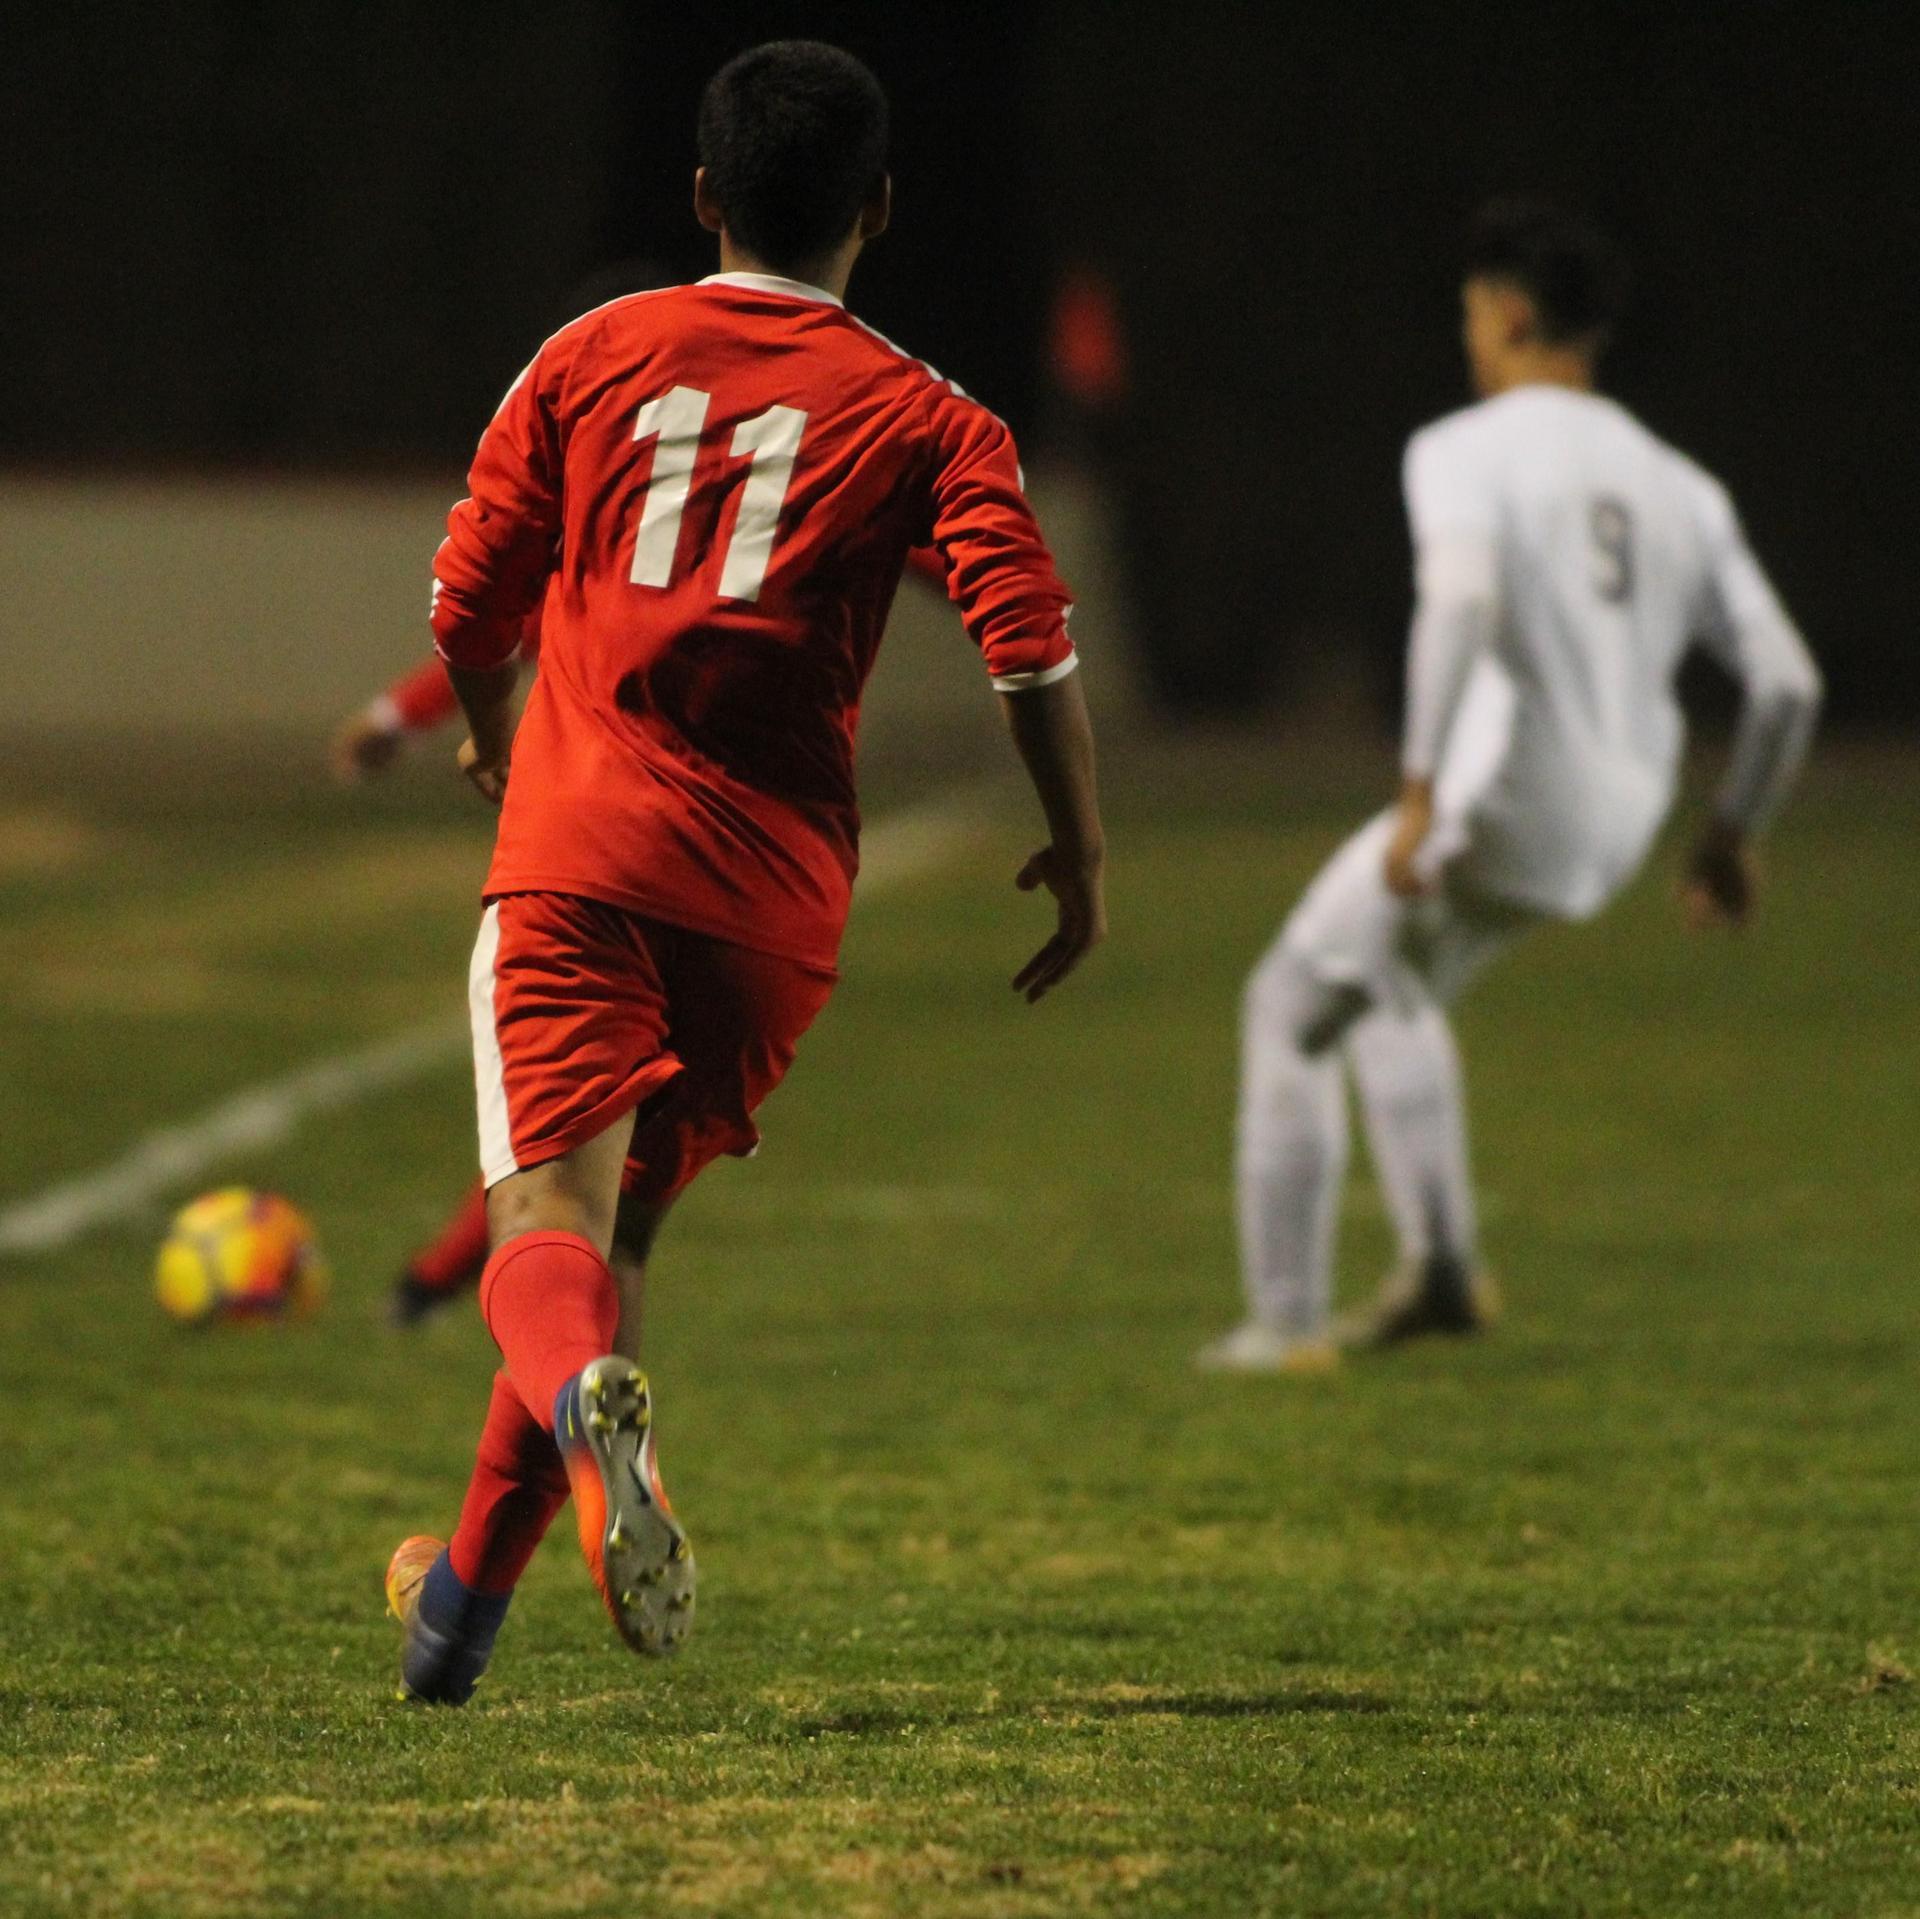 Crsitobal Galvan running towards ball